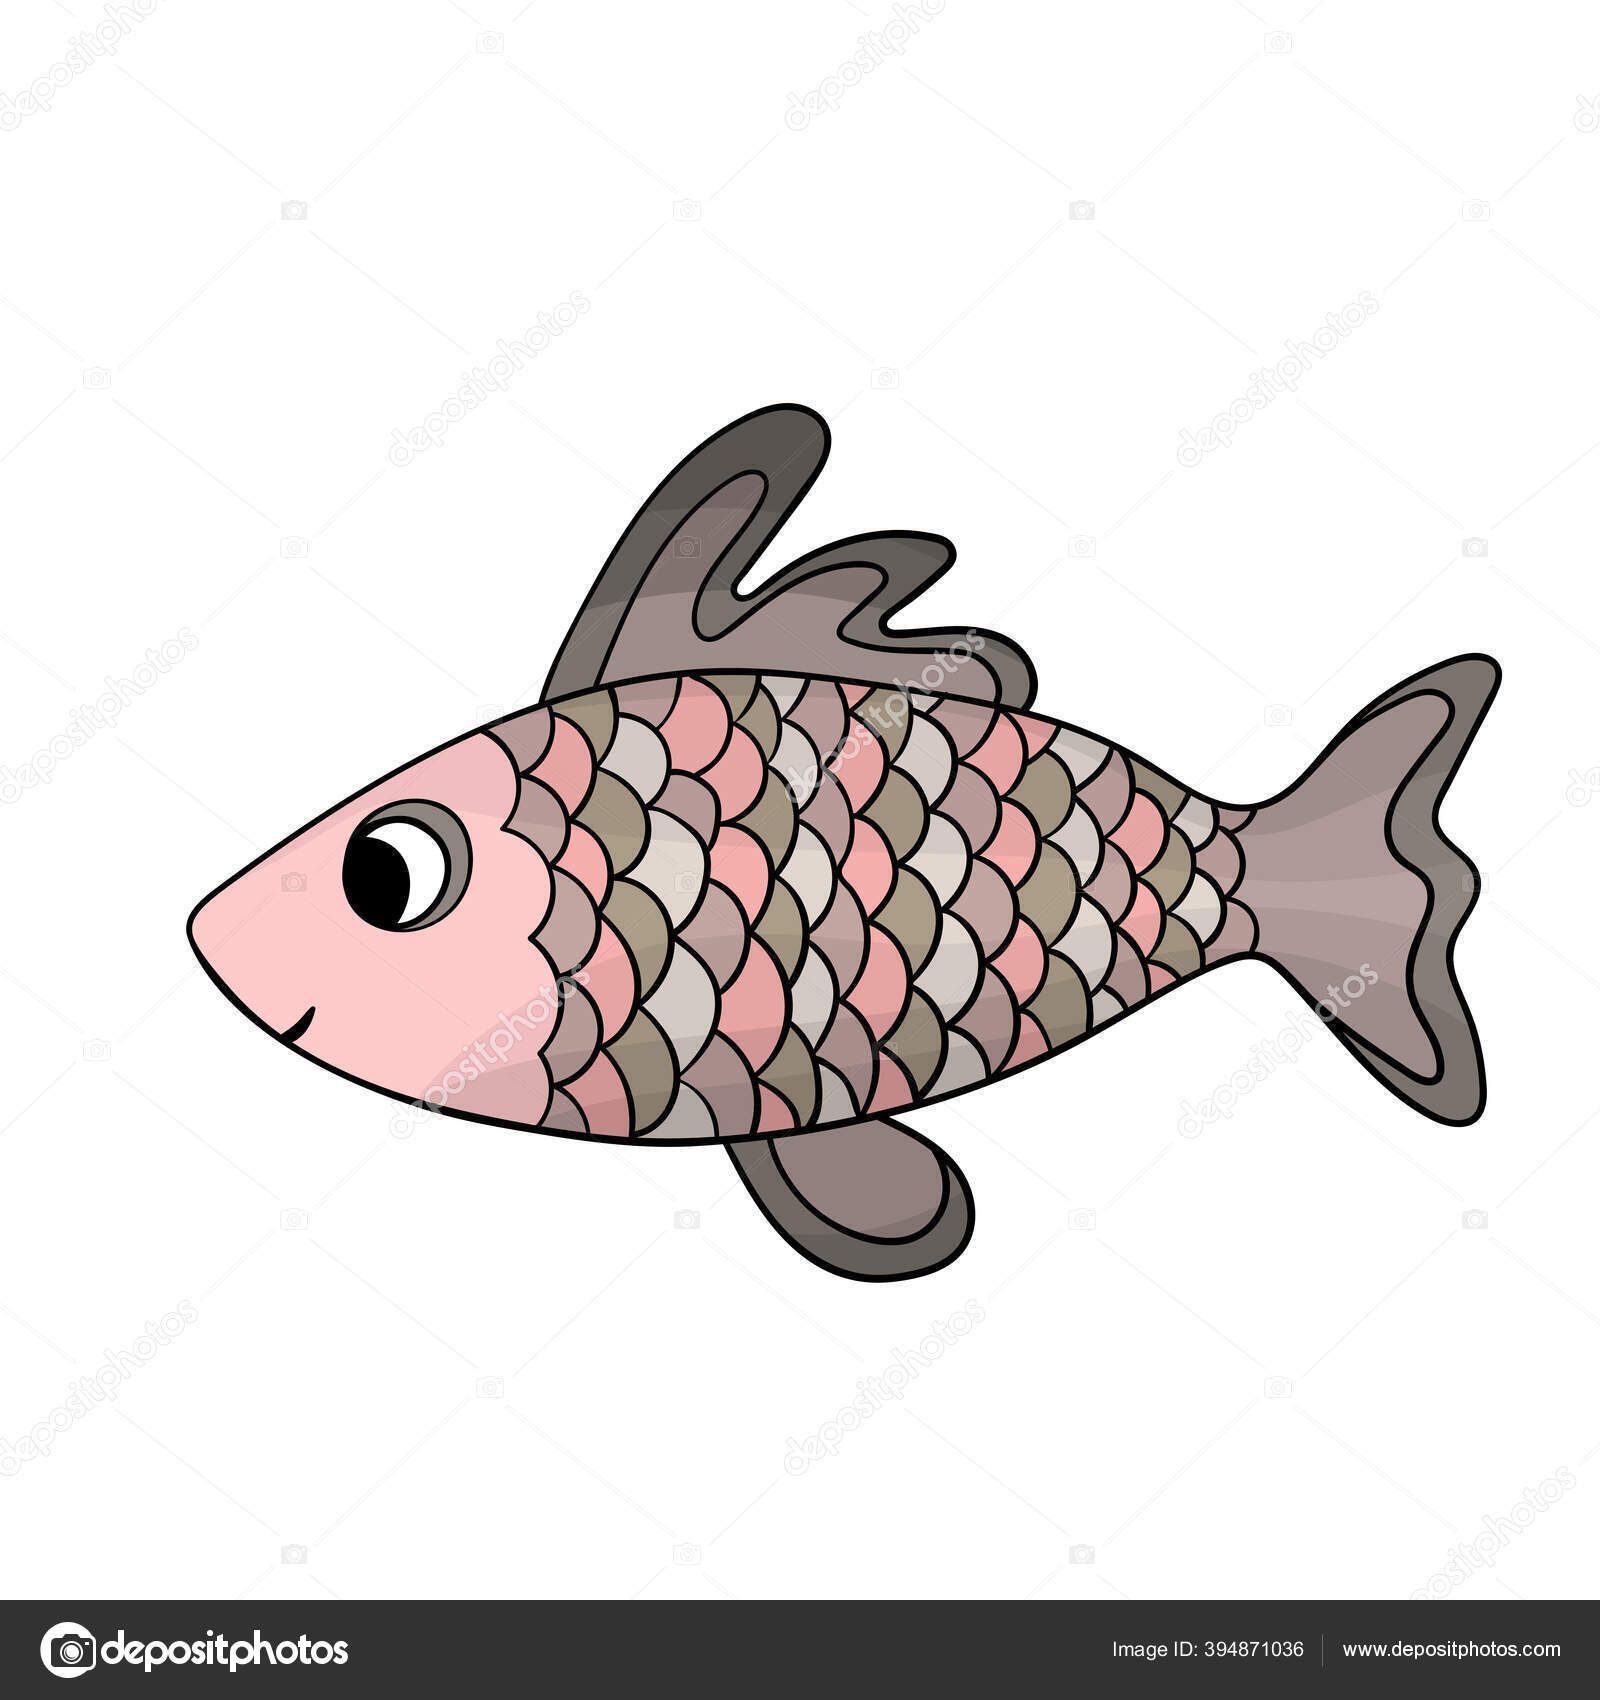 depositphotos 394871036 stock illustration cute colorful fish isolated white